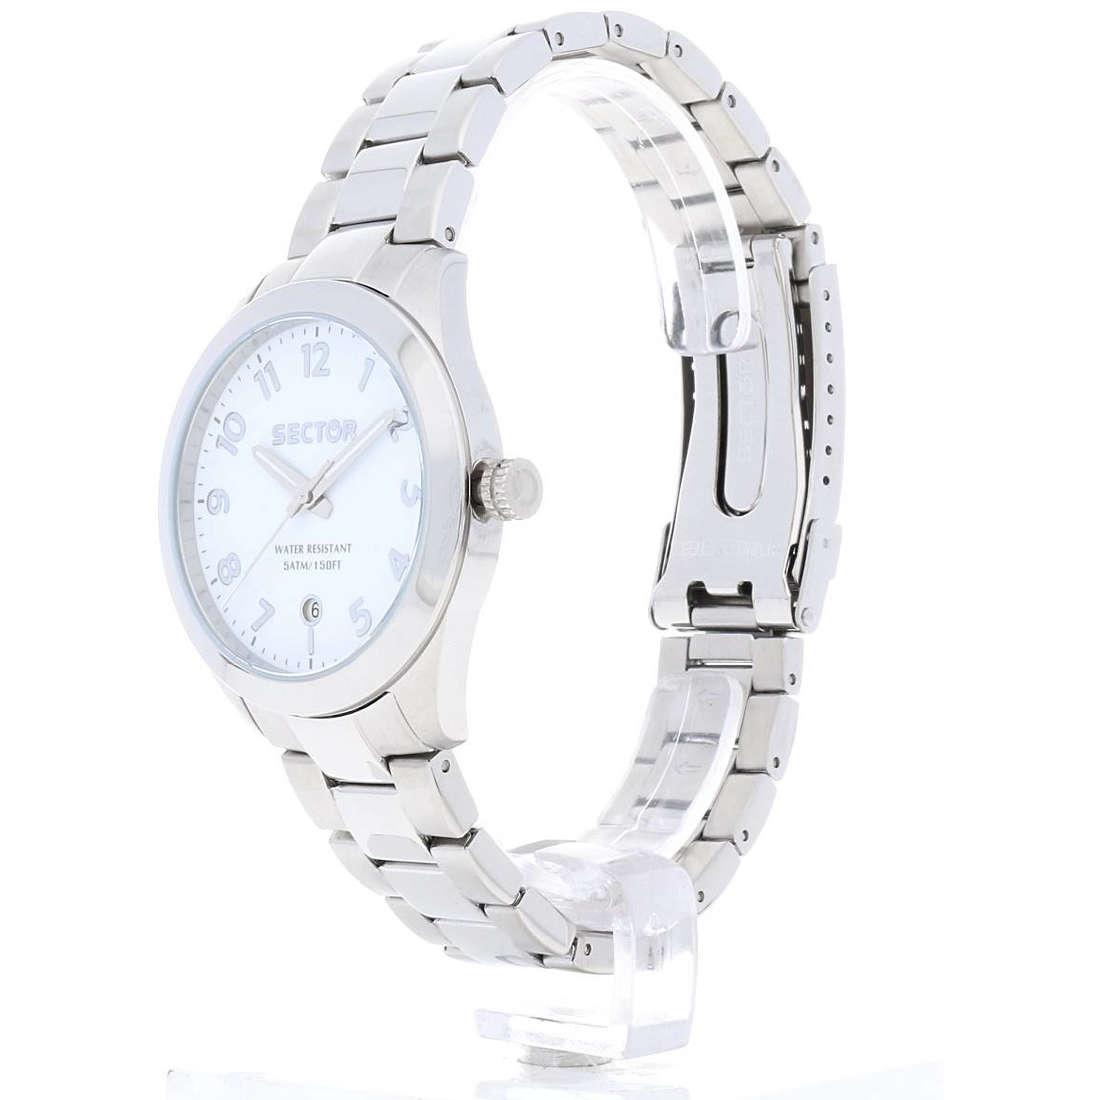 vente montres femme Sector R3253588509